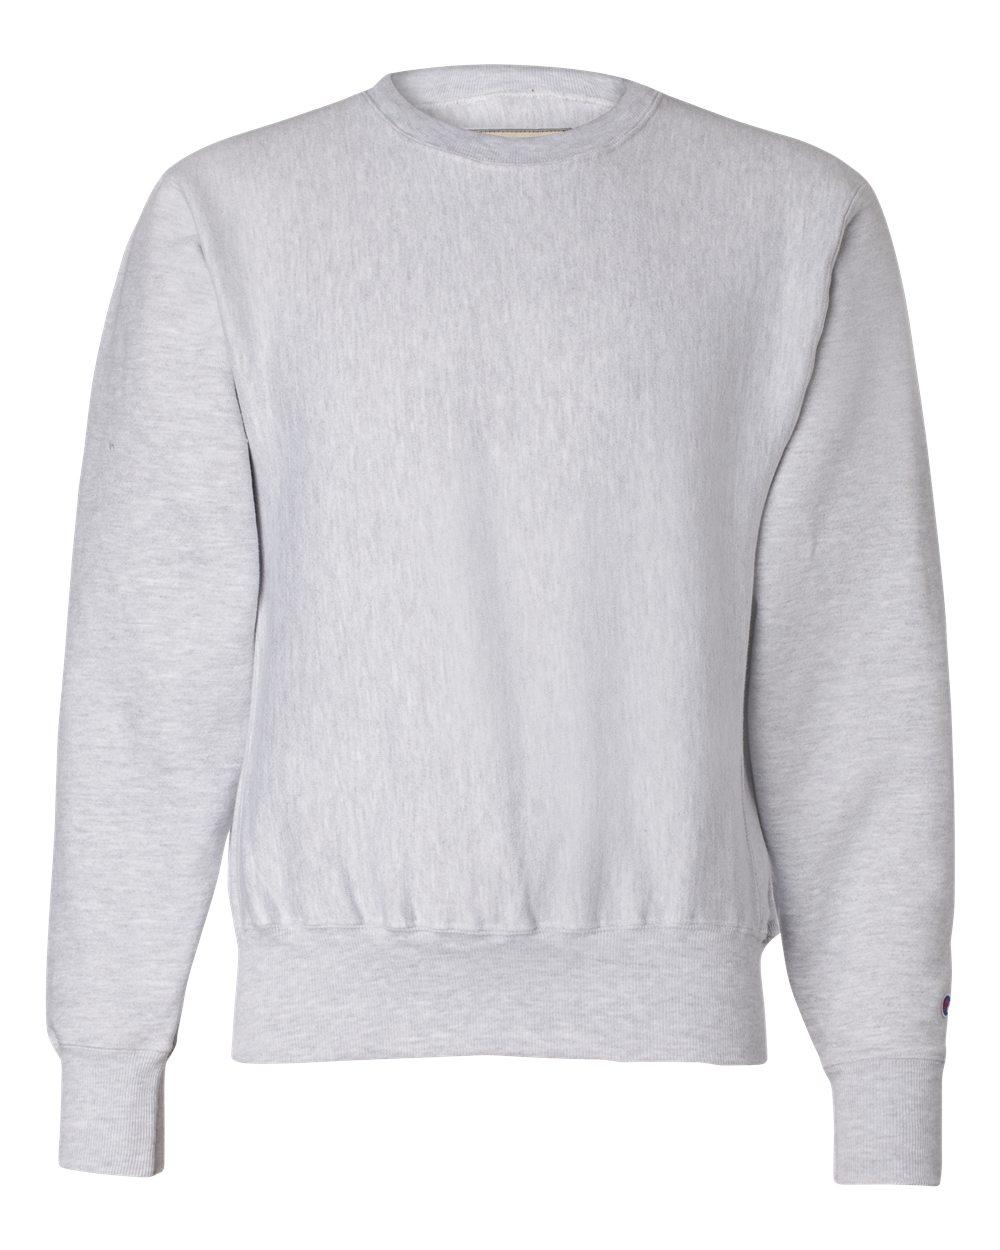 Champion-Mens-Reverse-Weave-Crewneck-Sweatshirt-Blank-Solid-S149-up-to-3XL thumbnail 15